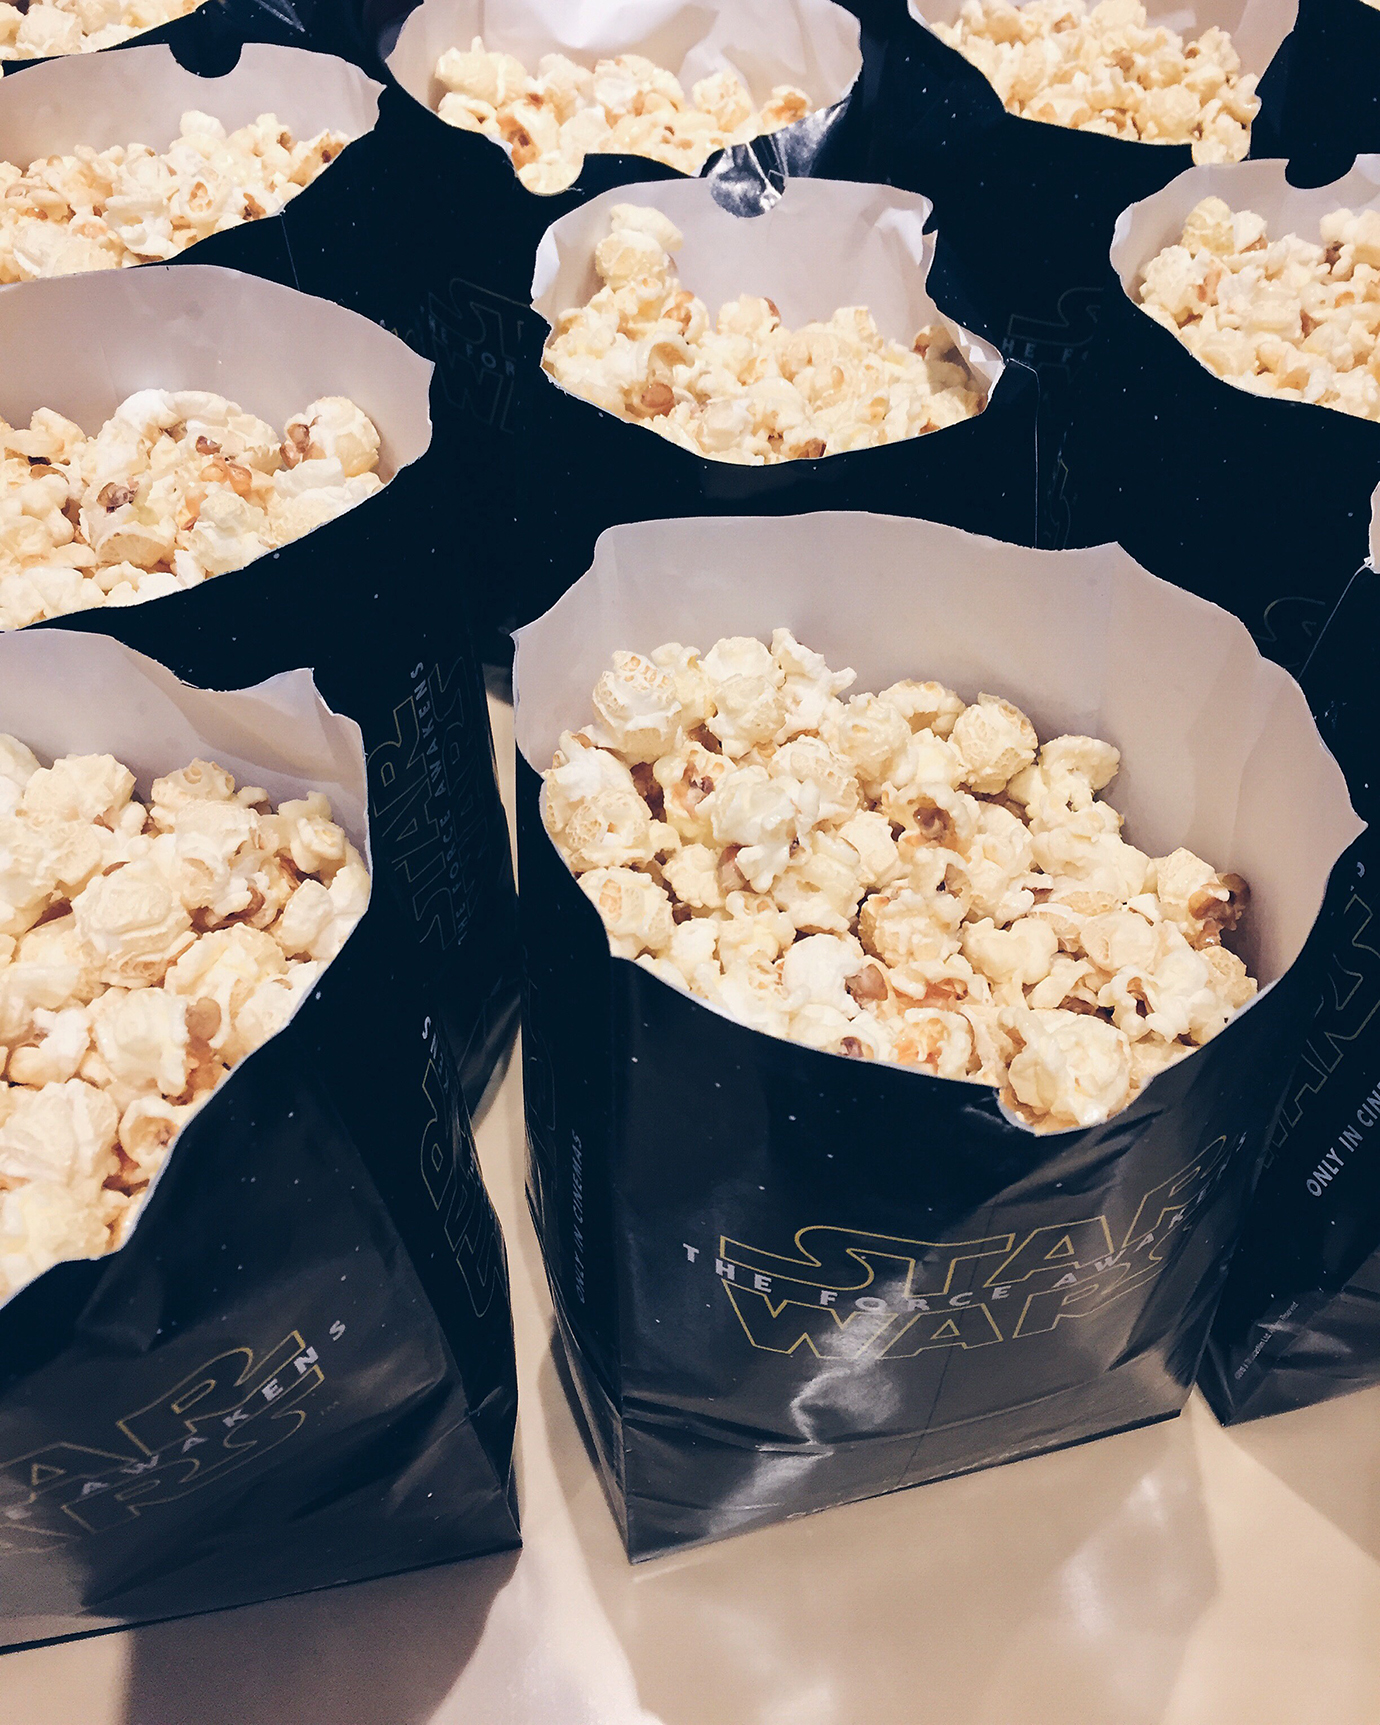 7things_51_popcorn